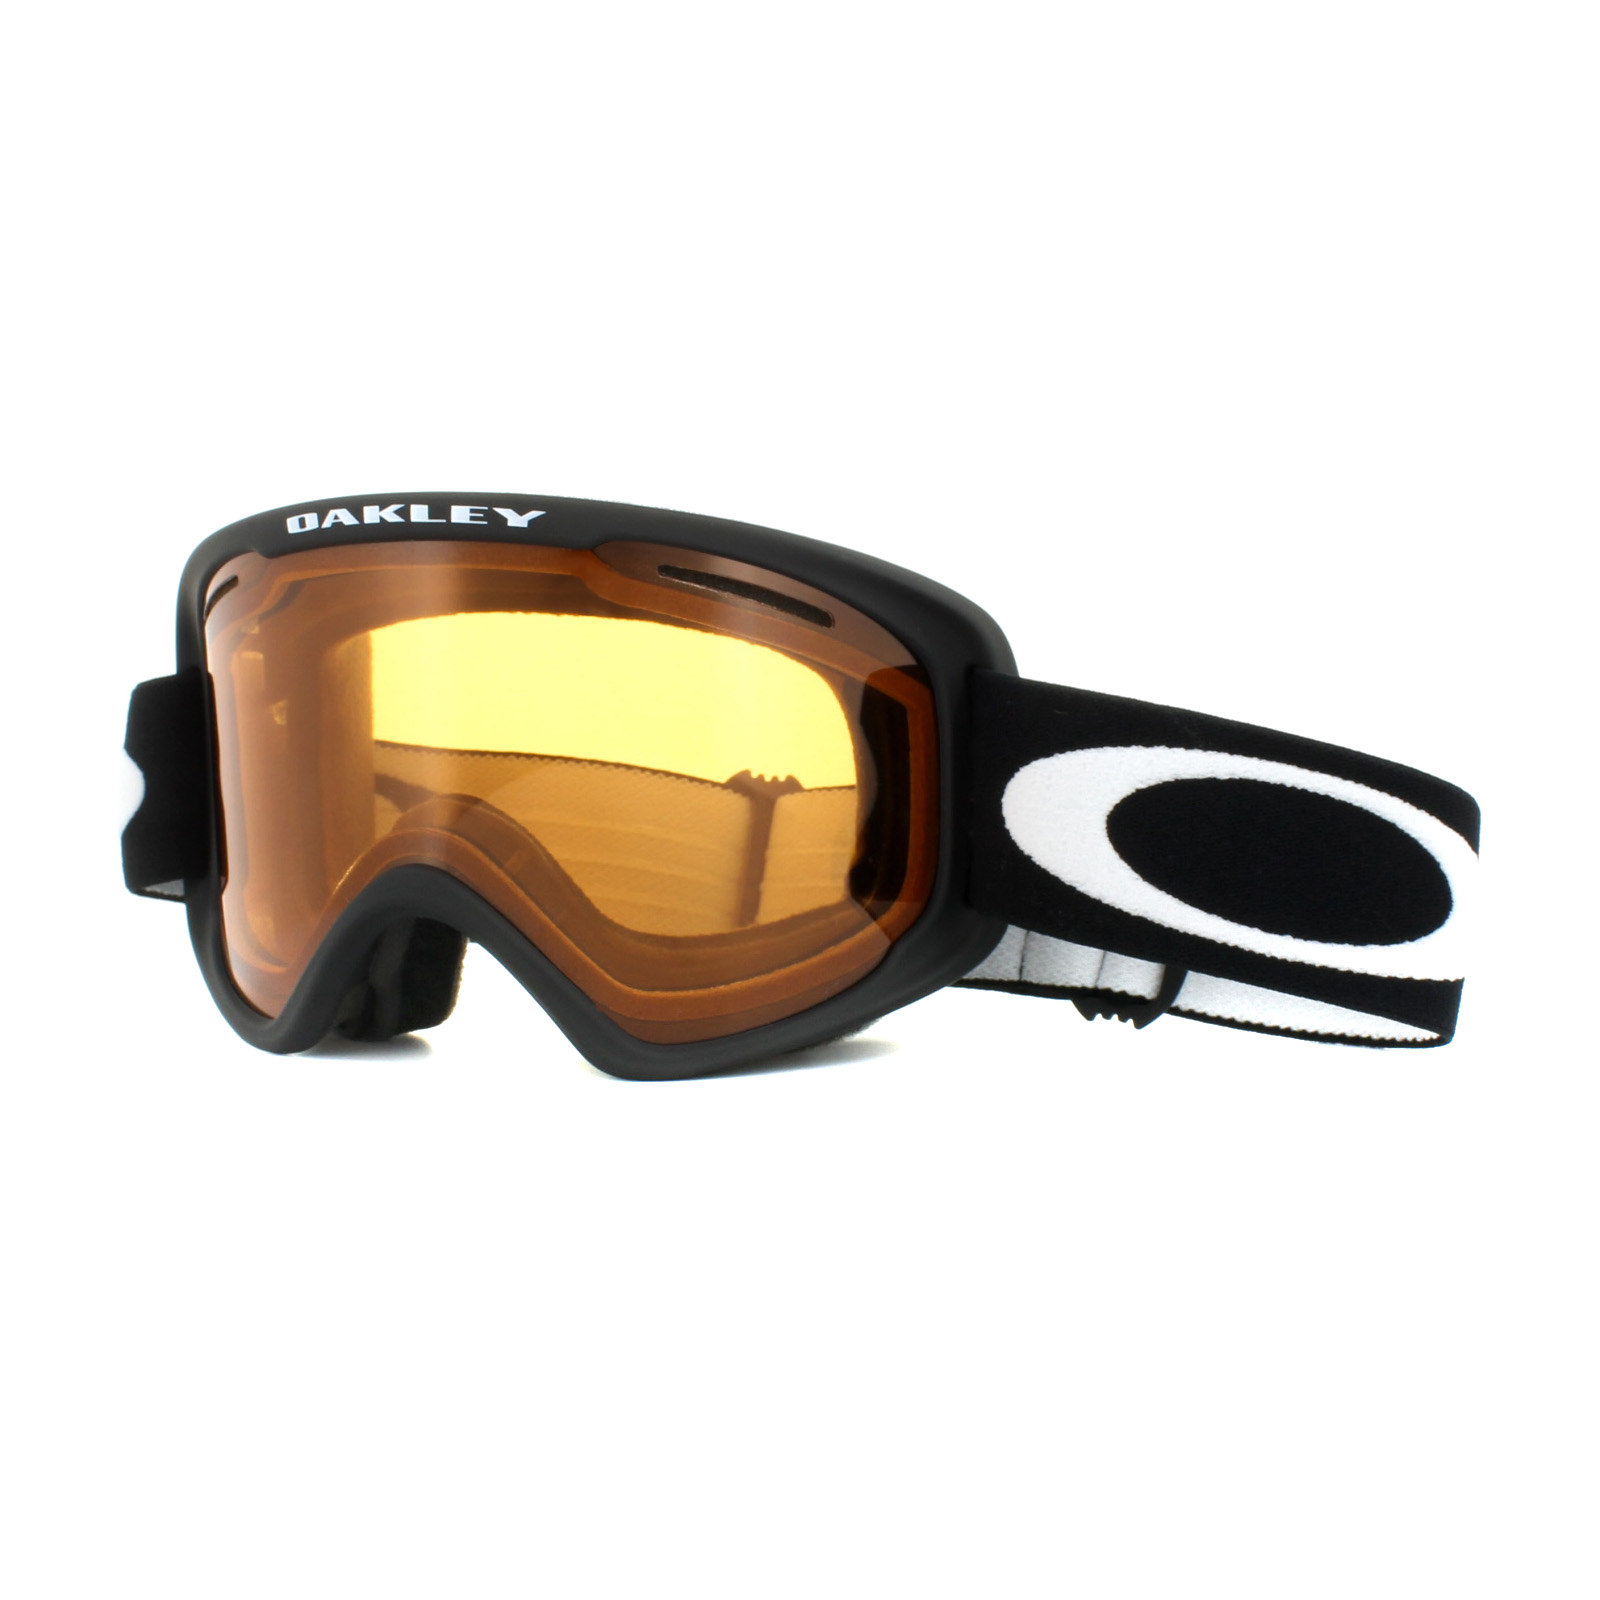 d8e8047bd9 Sentinel Oakley Ski Goggles O2 XM OO7066-20 Matt Black Persimmon